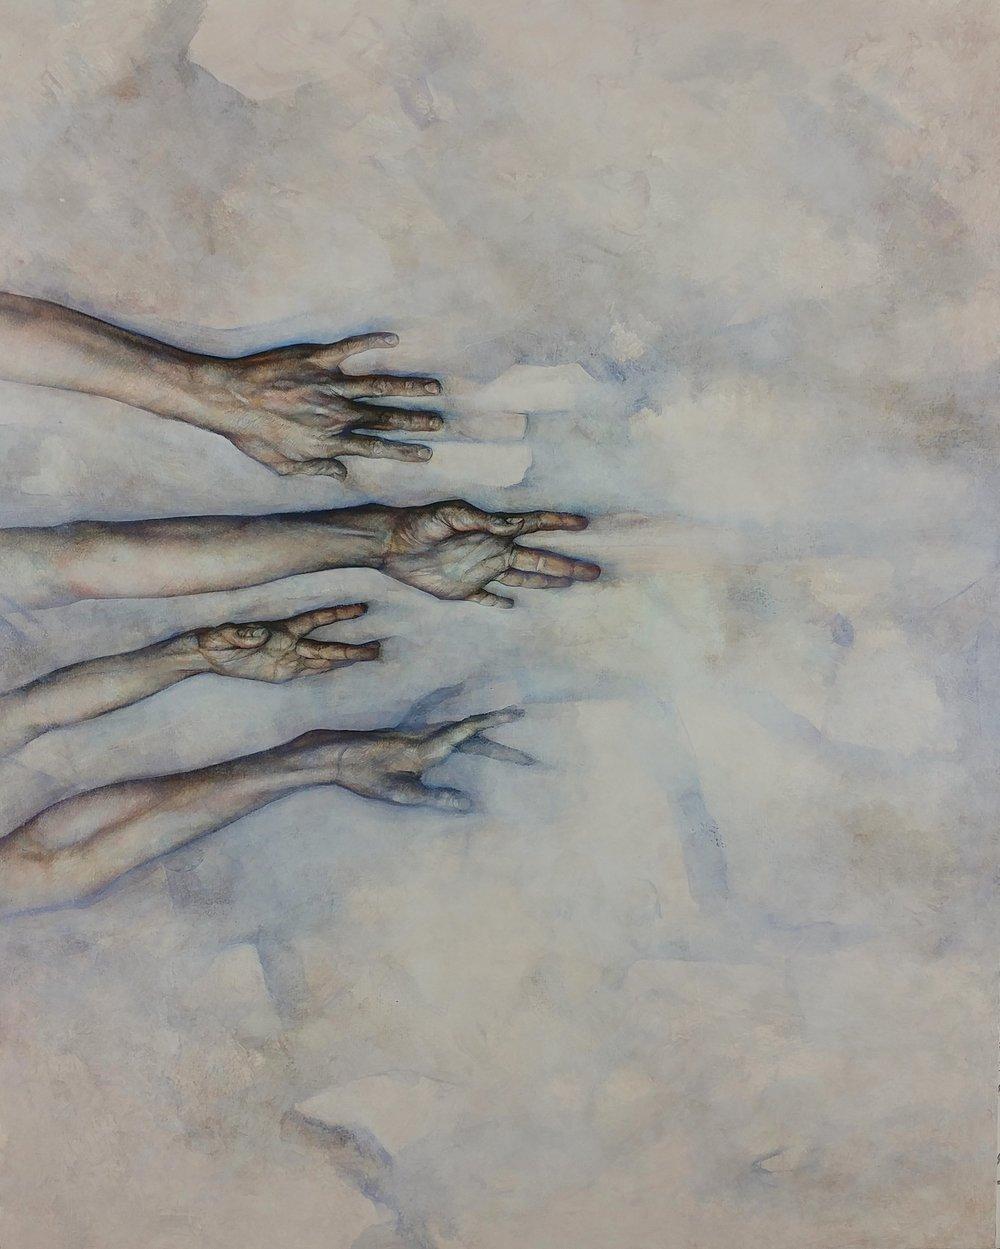 Veil / Death Grip